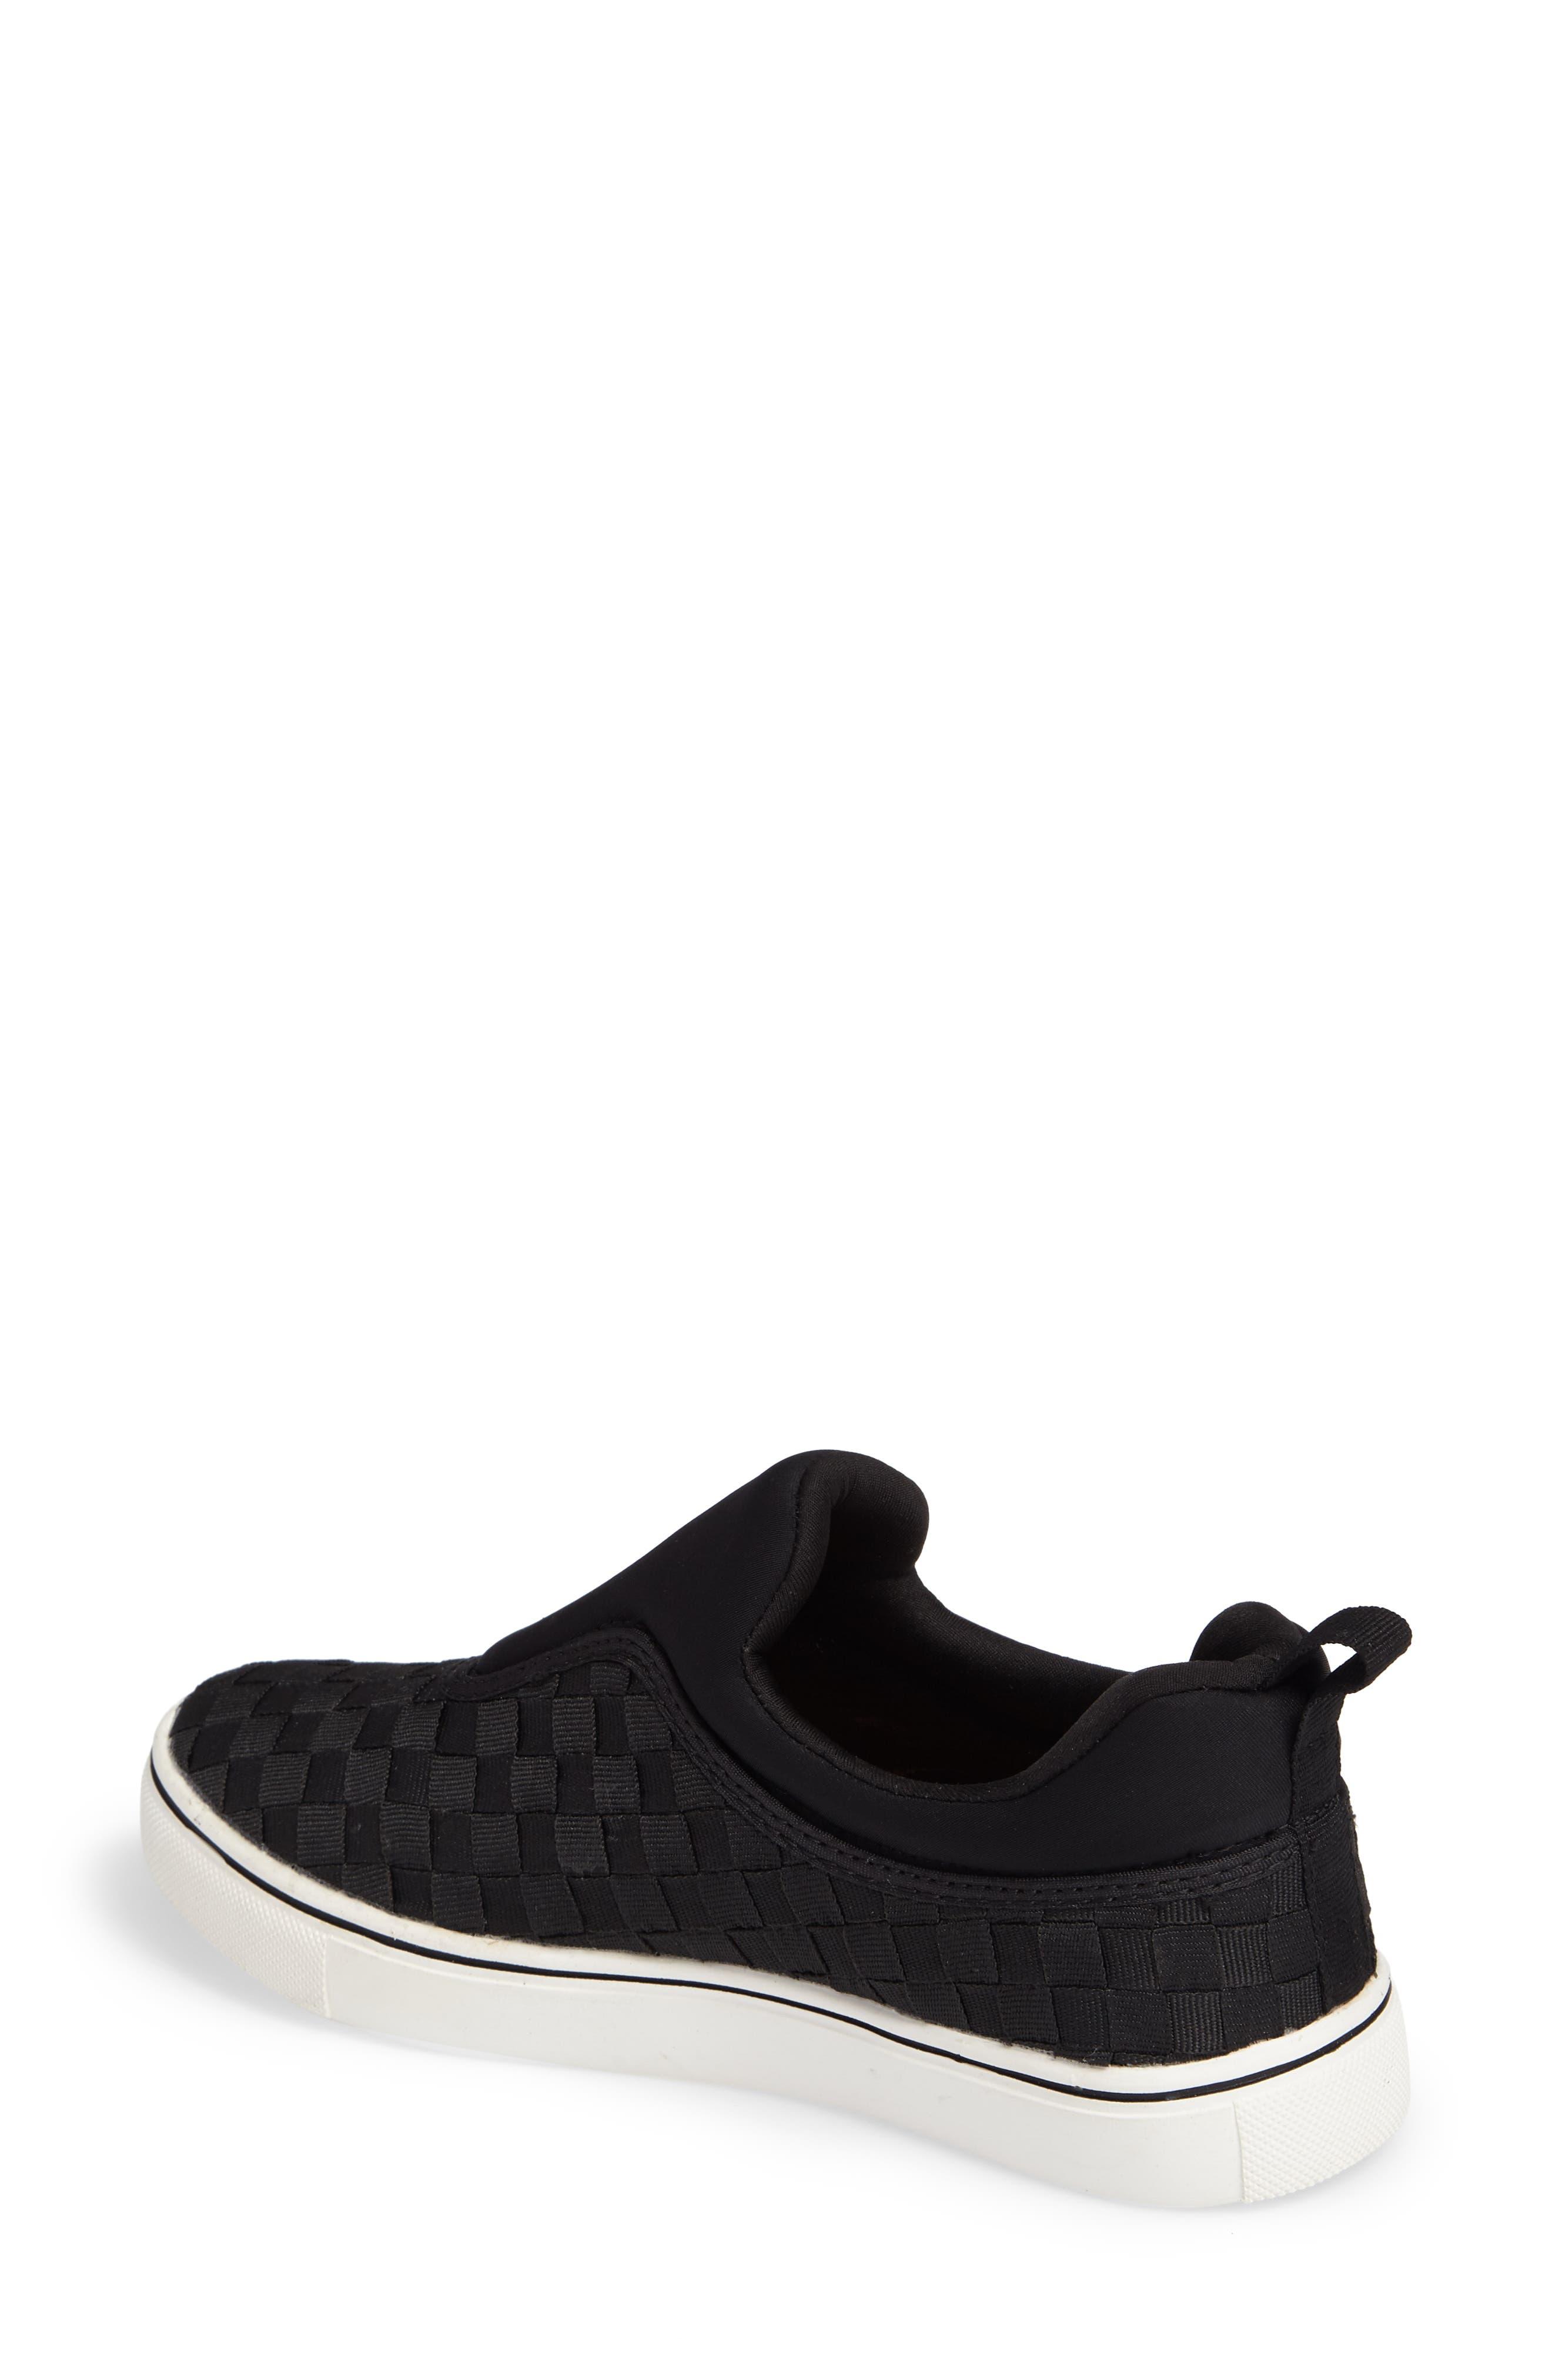 Bernie Mev Joan Slip-On Sneaker,                             Alternate thumbnail 2, color,                             BLACK/ BLACK FABRIC